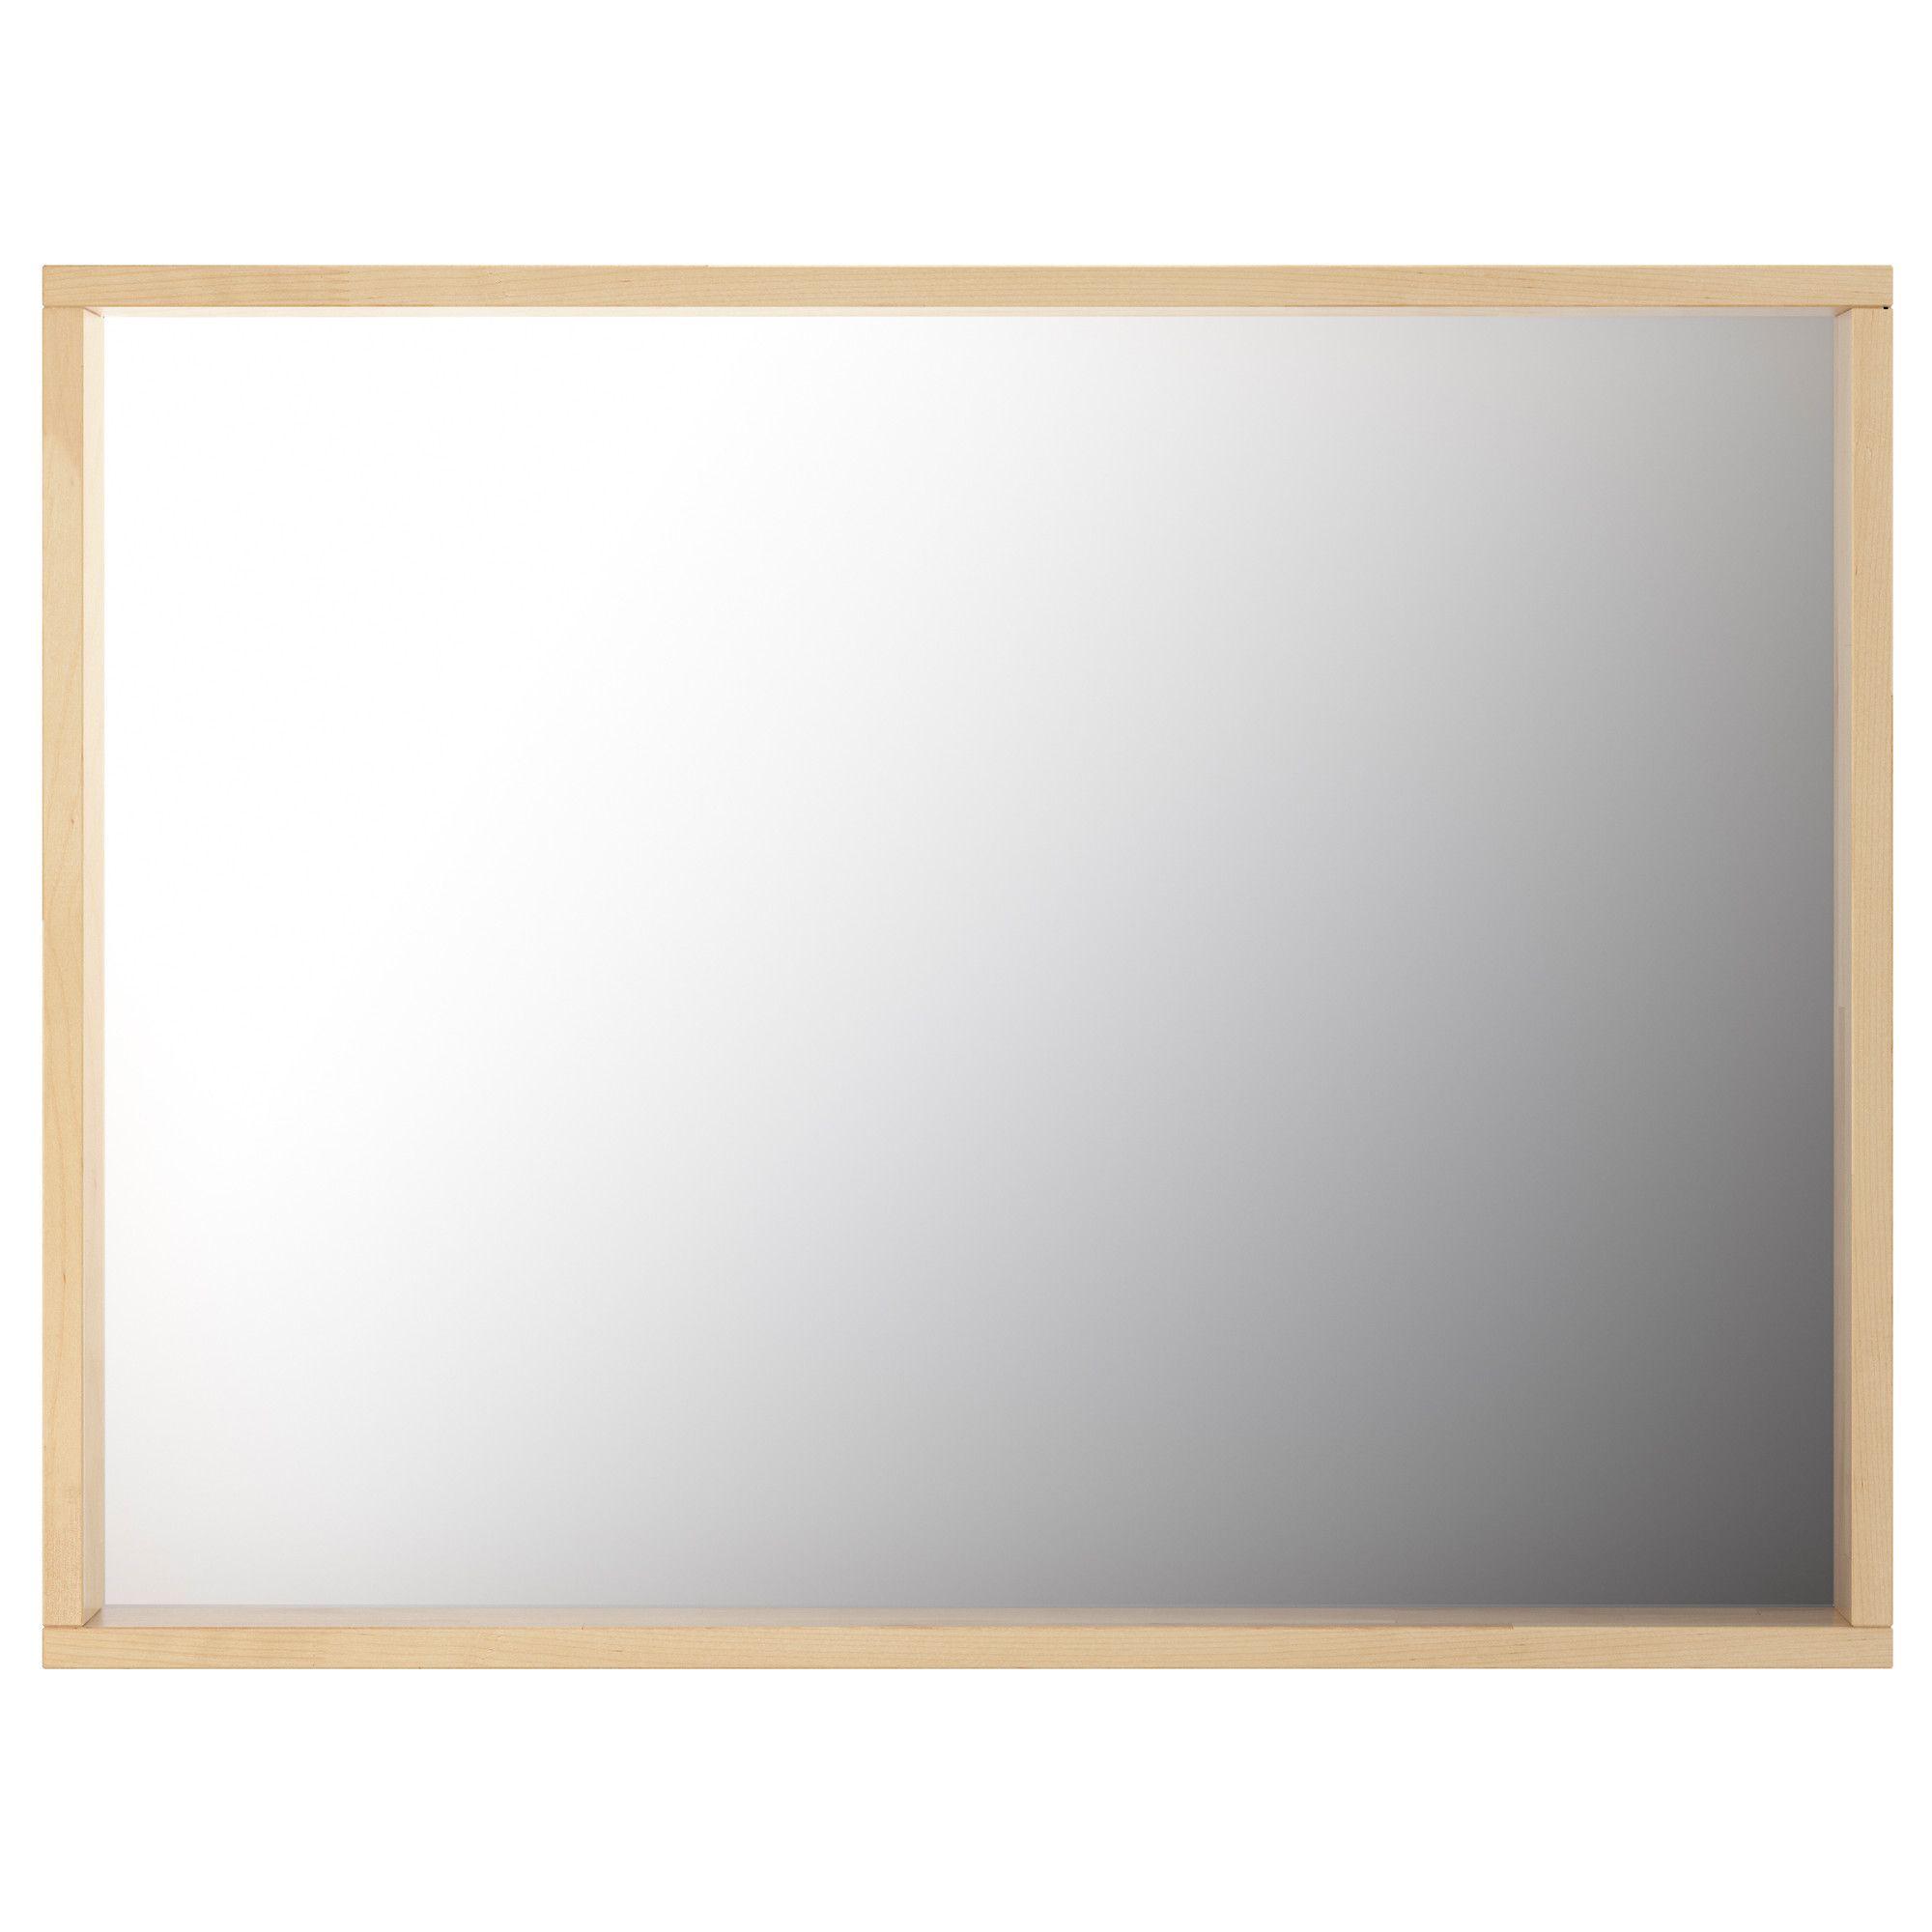 molger miroir rebords bouleau ikea id es appart nantes pinterest rebord miroirs et. Black Bedroom Furniture Sets. Home Design Ideas